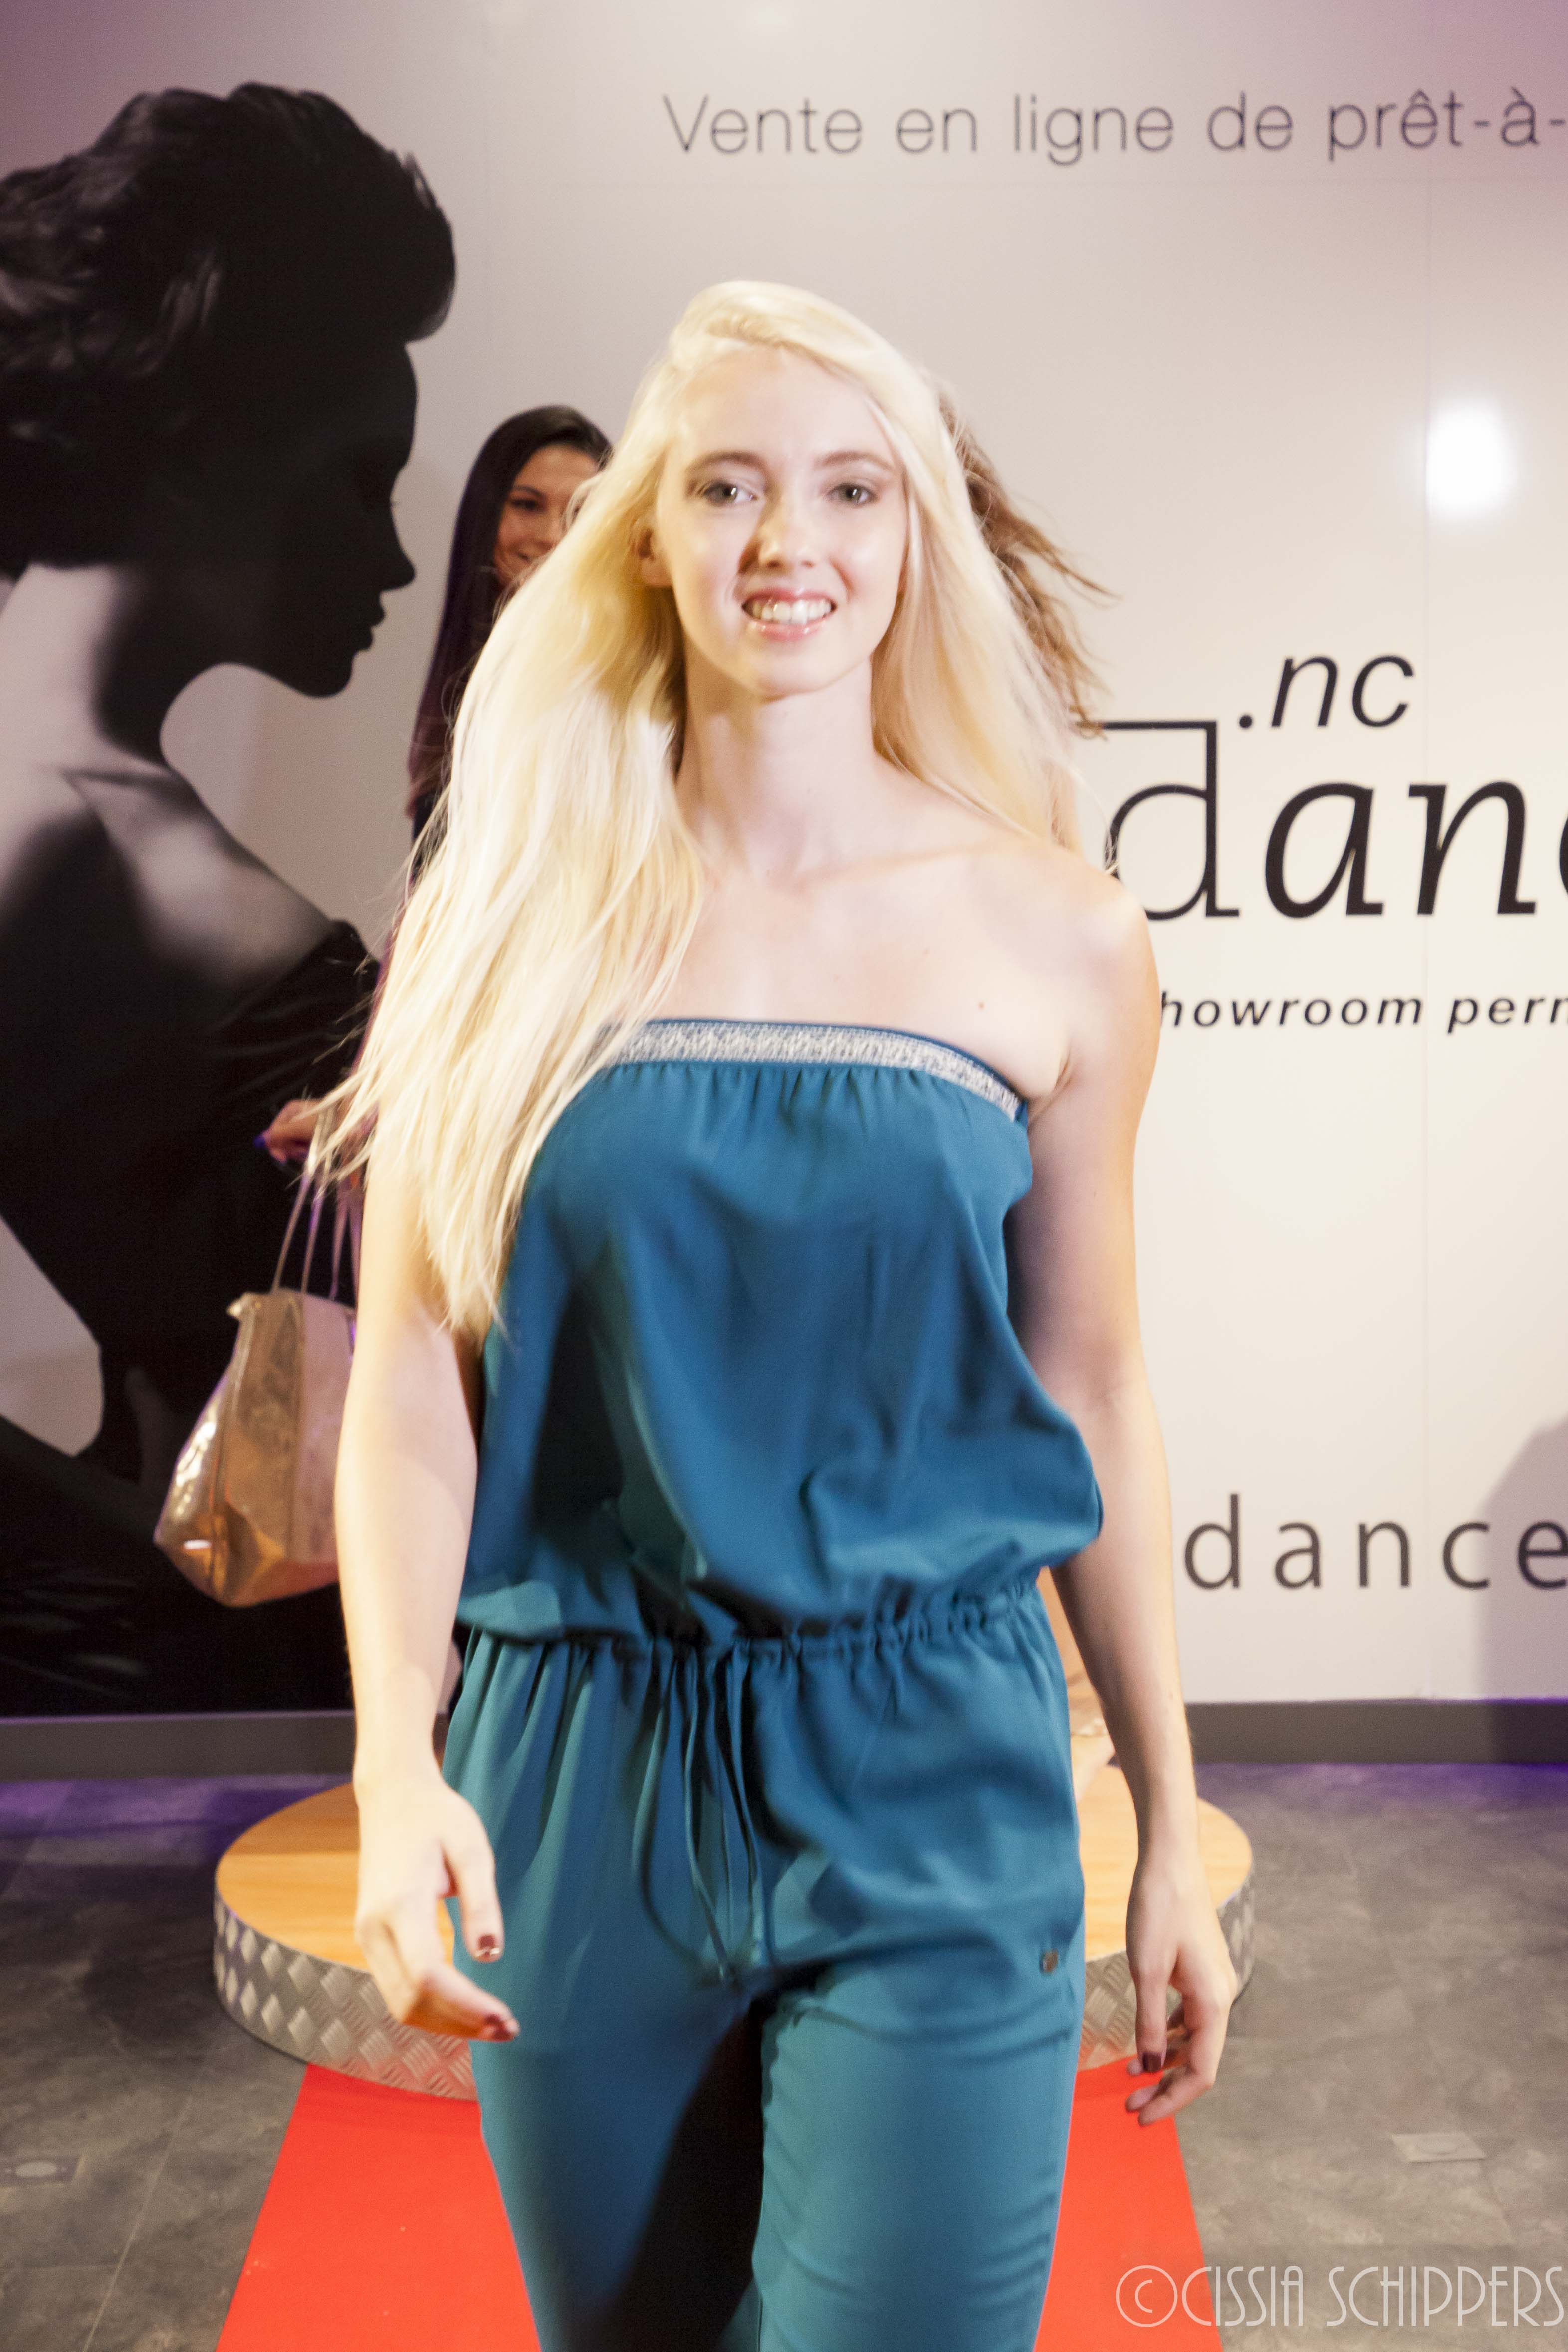 Tendance NC 2017 by Cissia Schippers photographe-8057